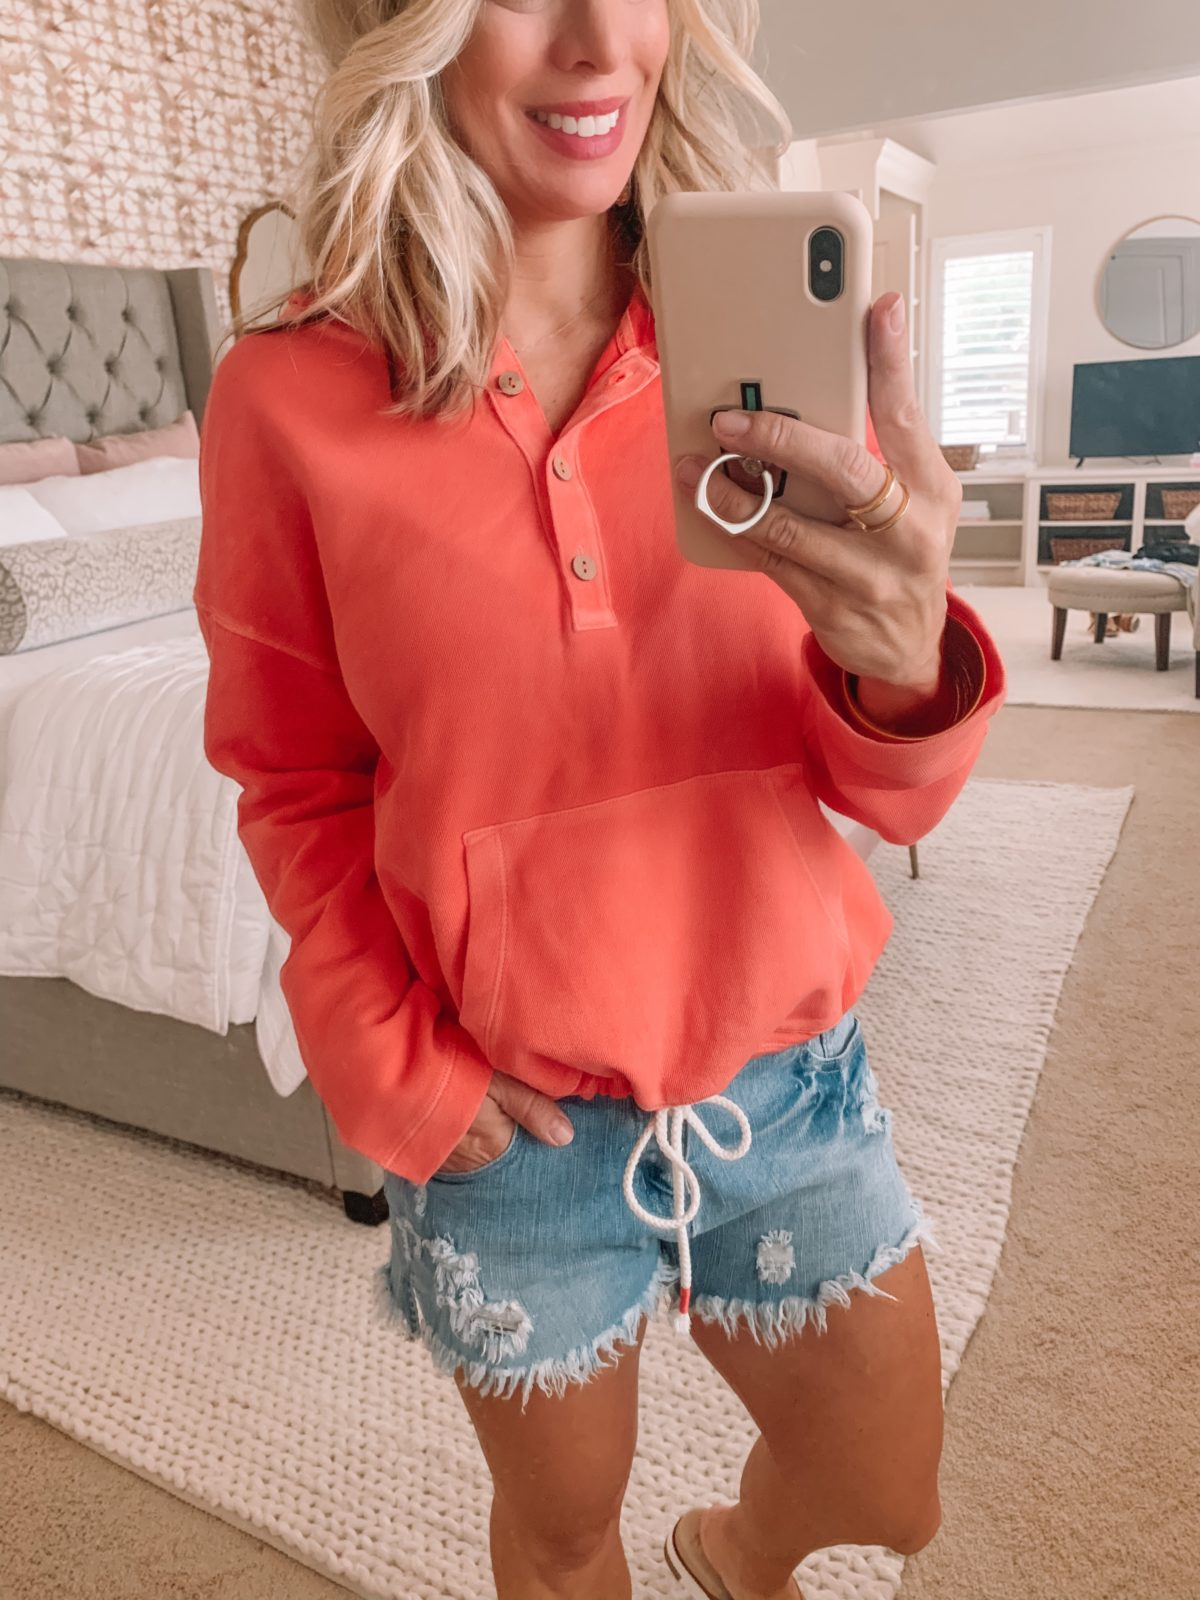 Dressing Room Finds Old Navy & Target, Coral Sweatshirt, Distressed Denim Shorts